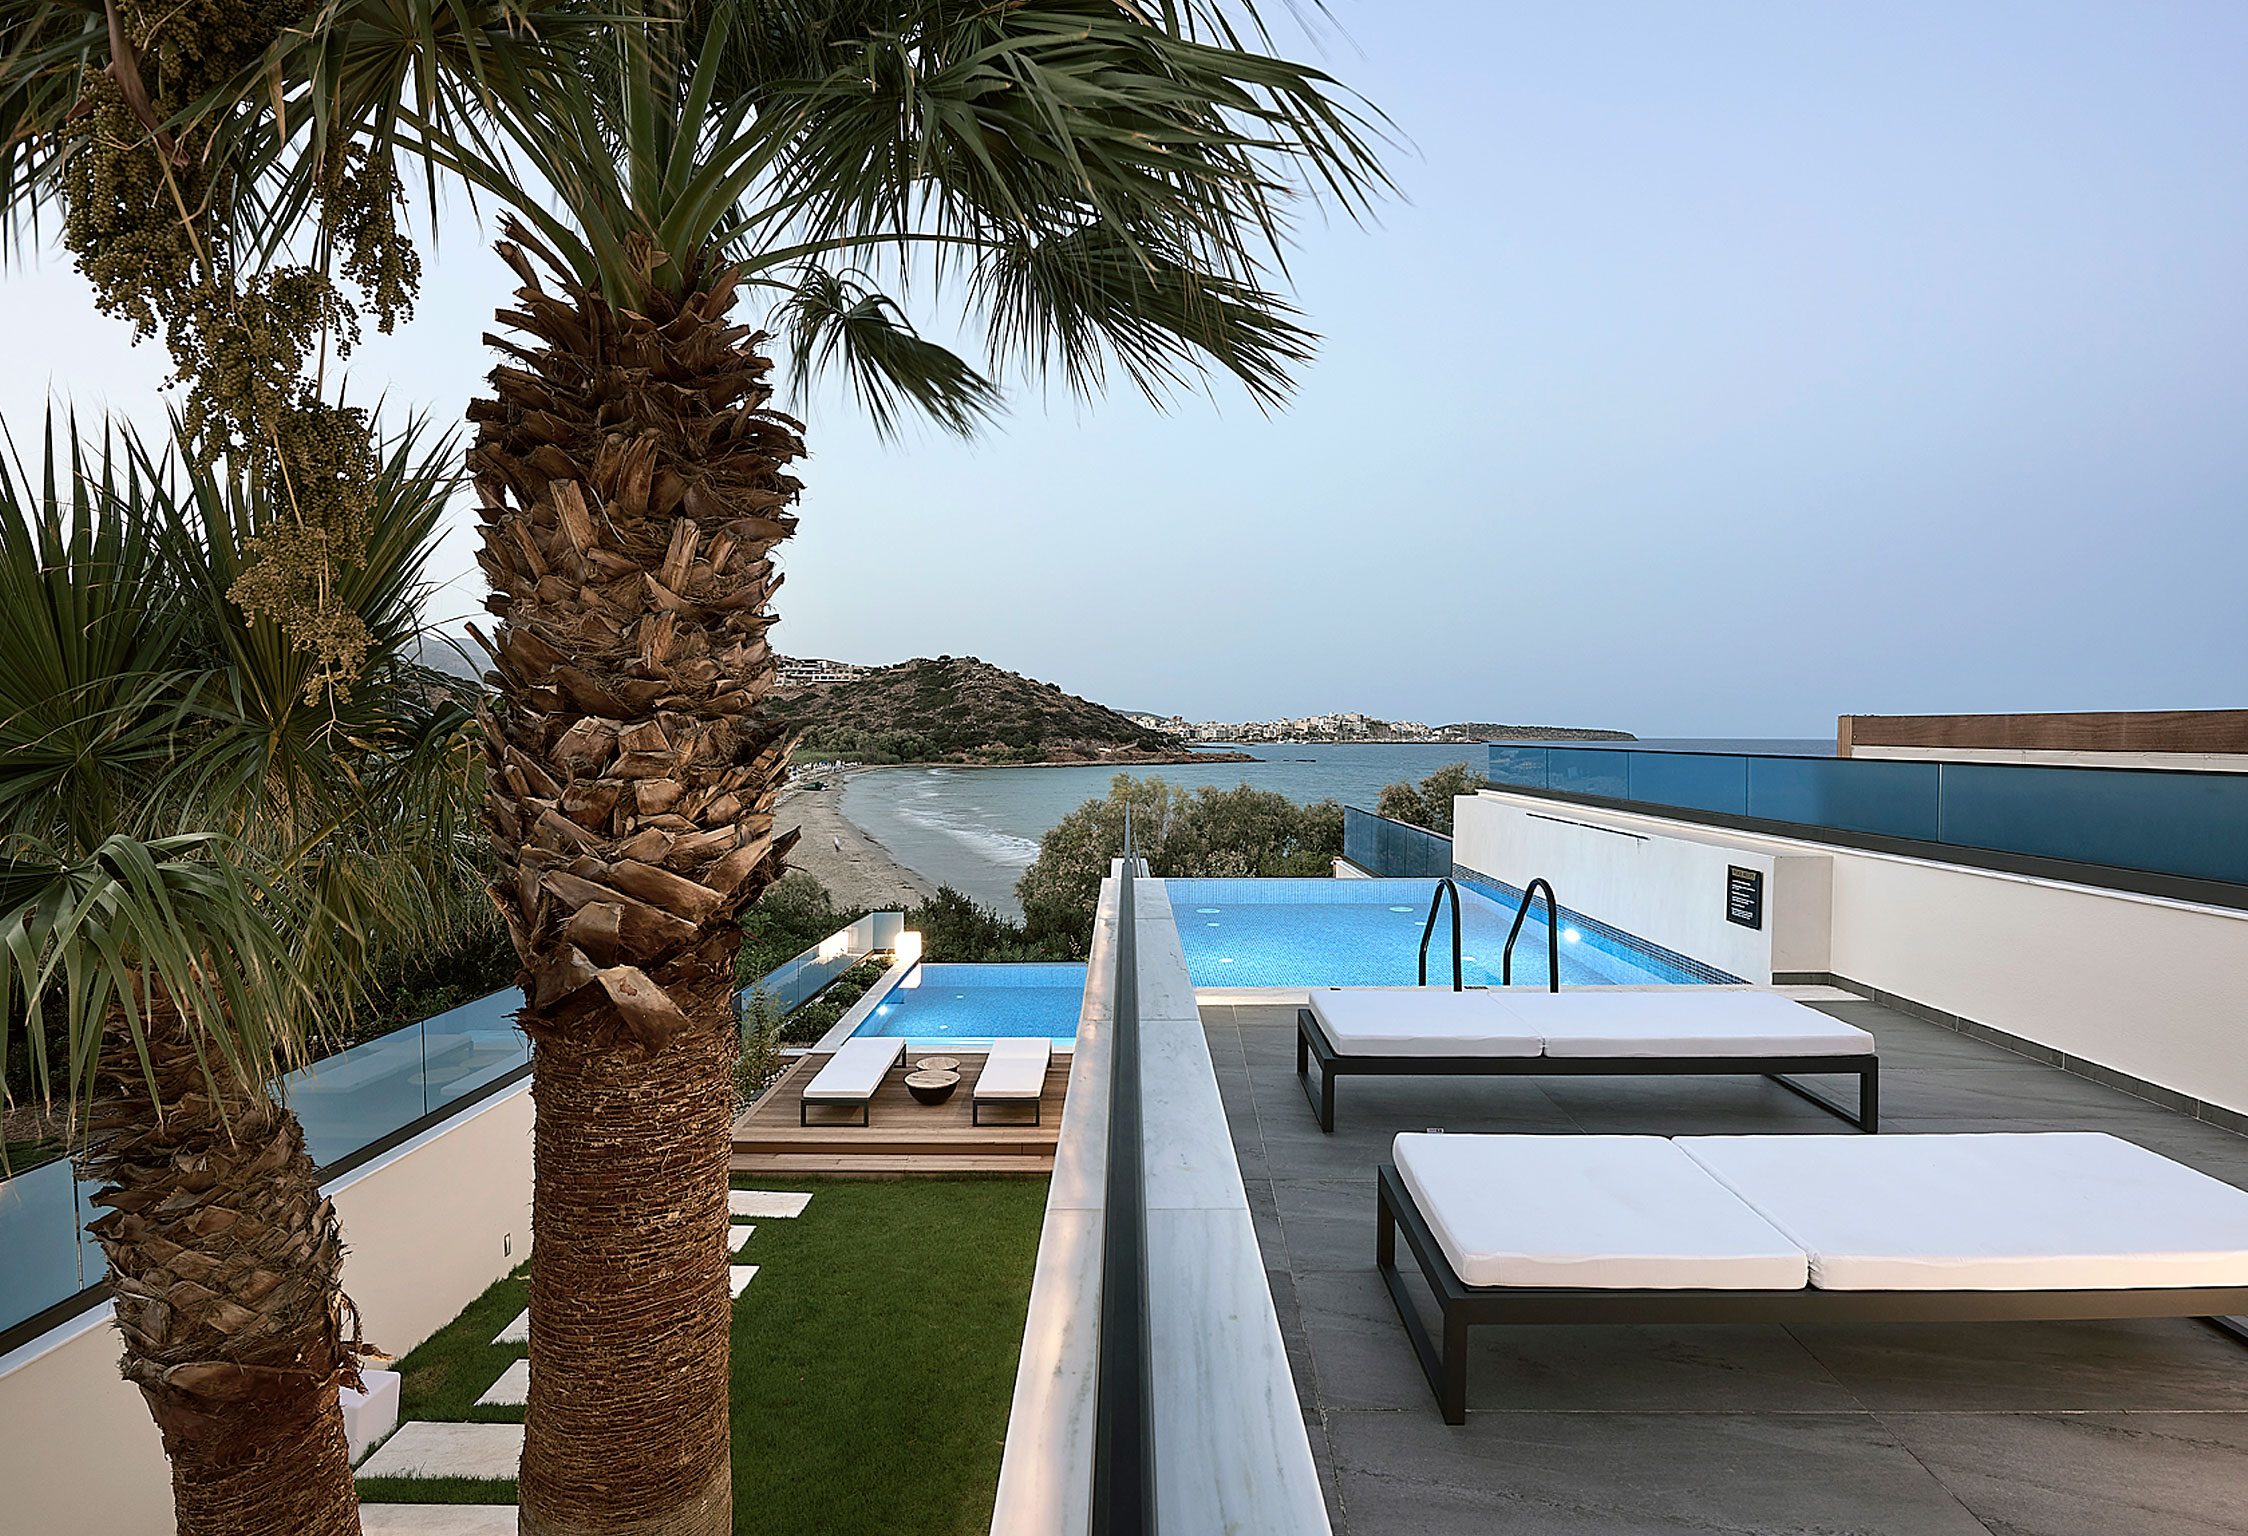 Crete Villa Naomi II jumbotron image